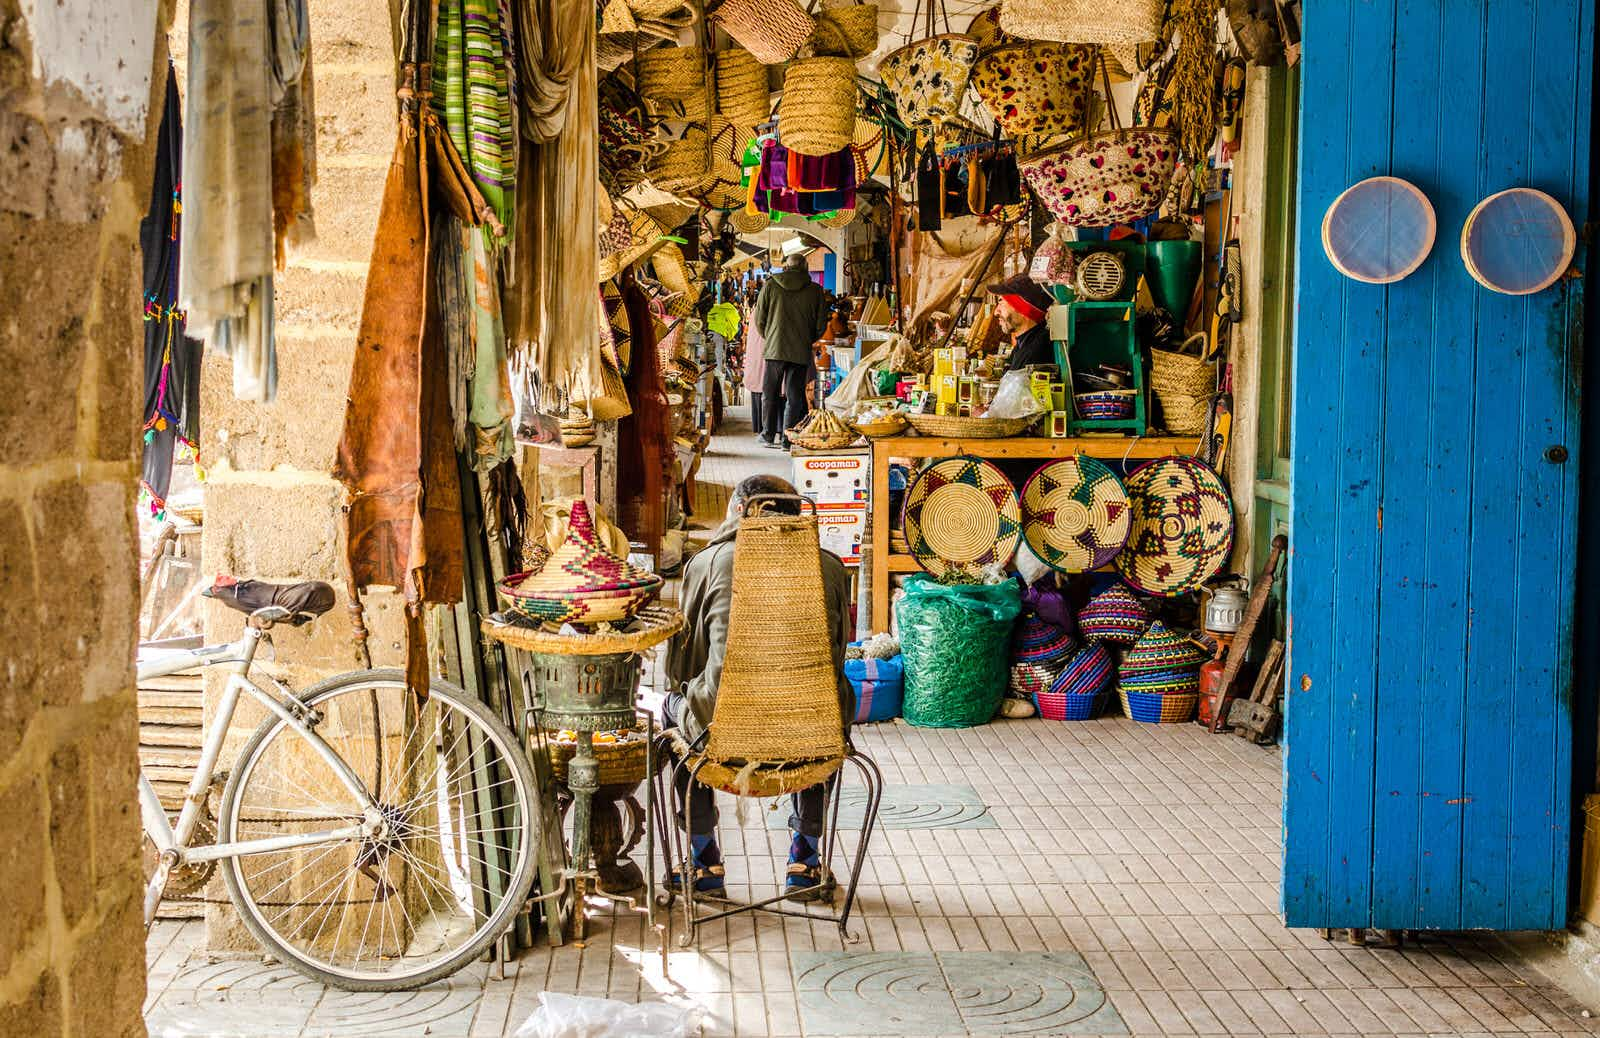 Shopping in Essaouira: where to buy what